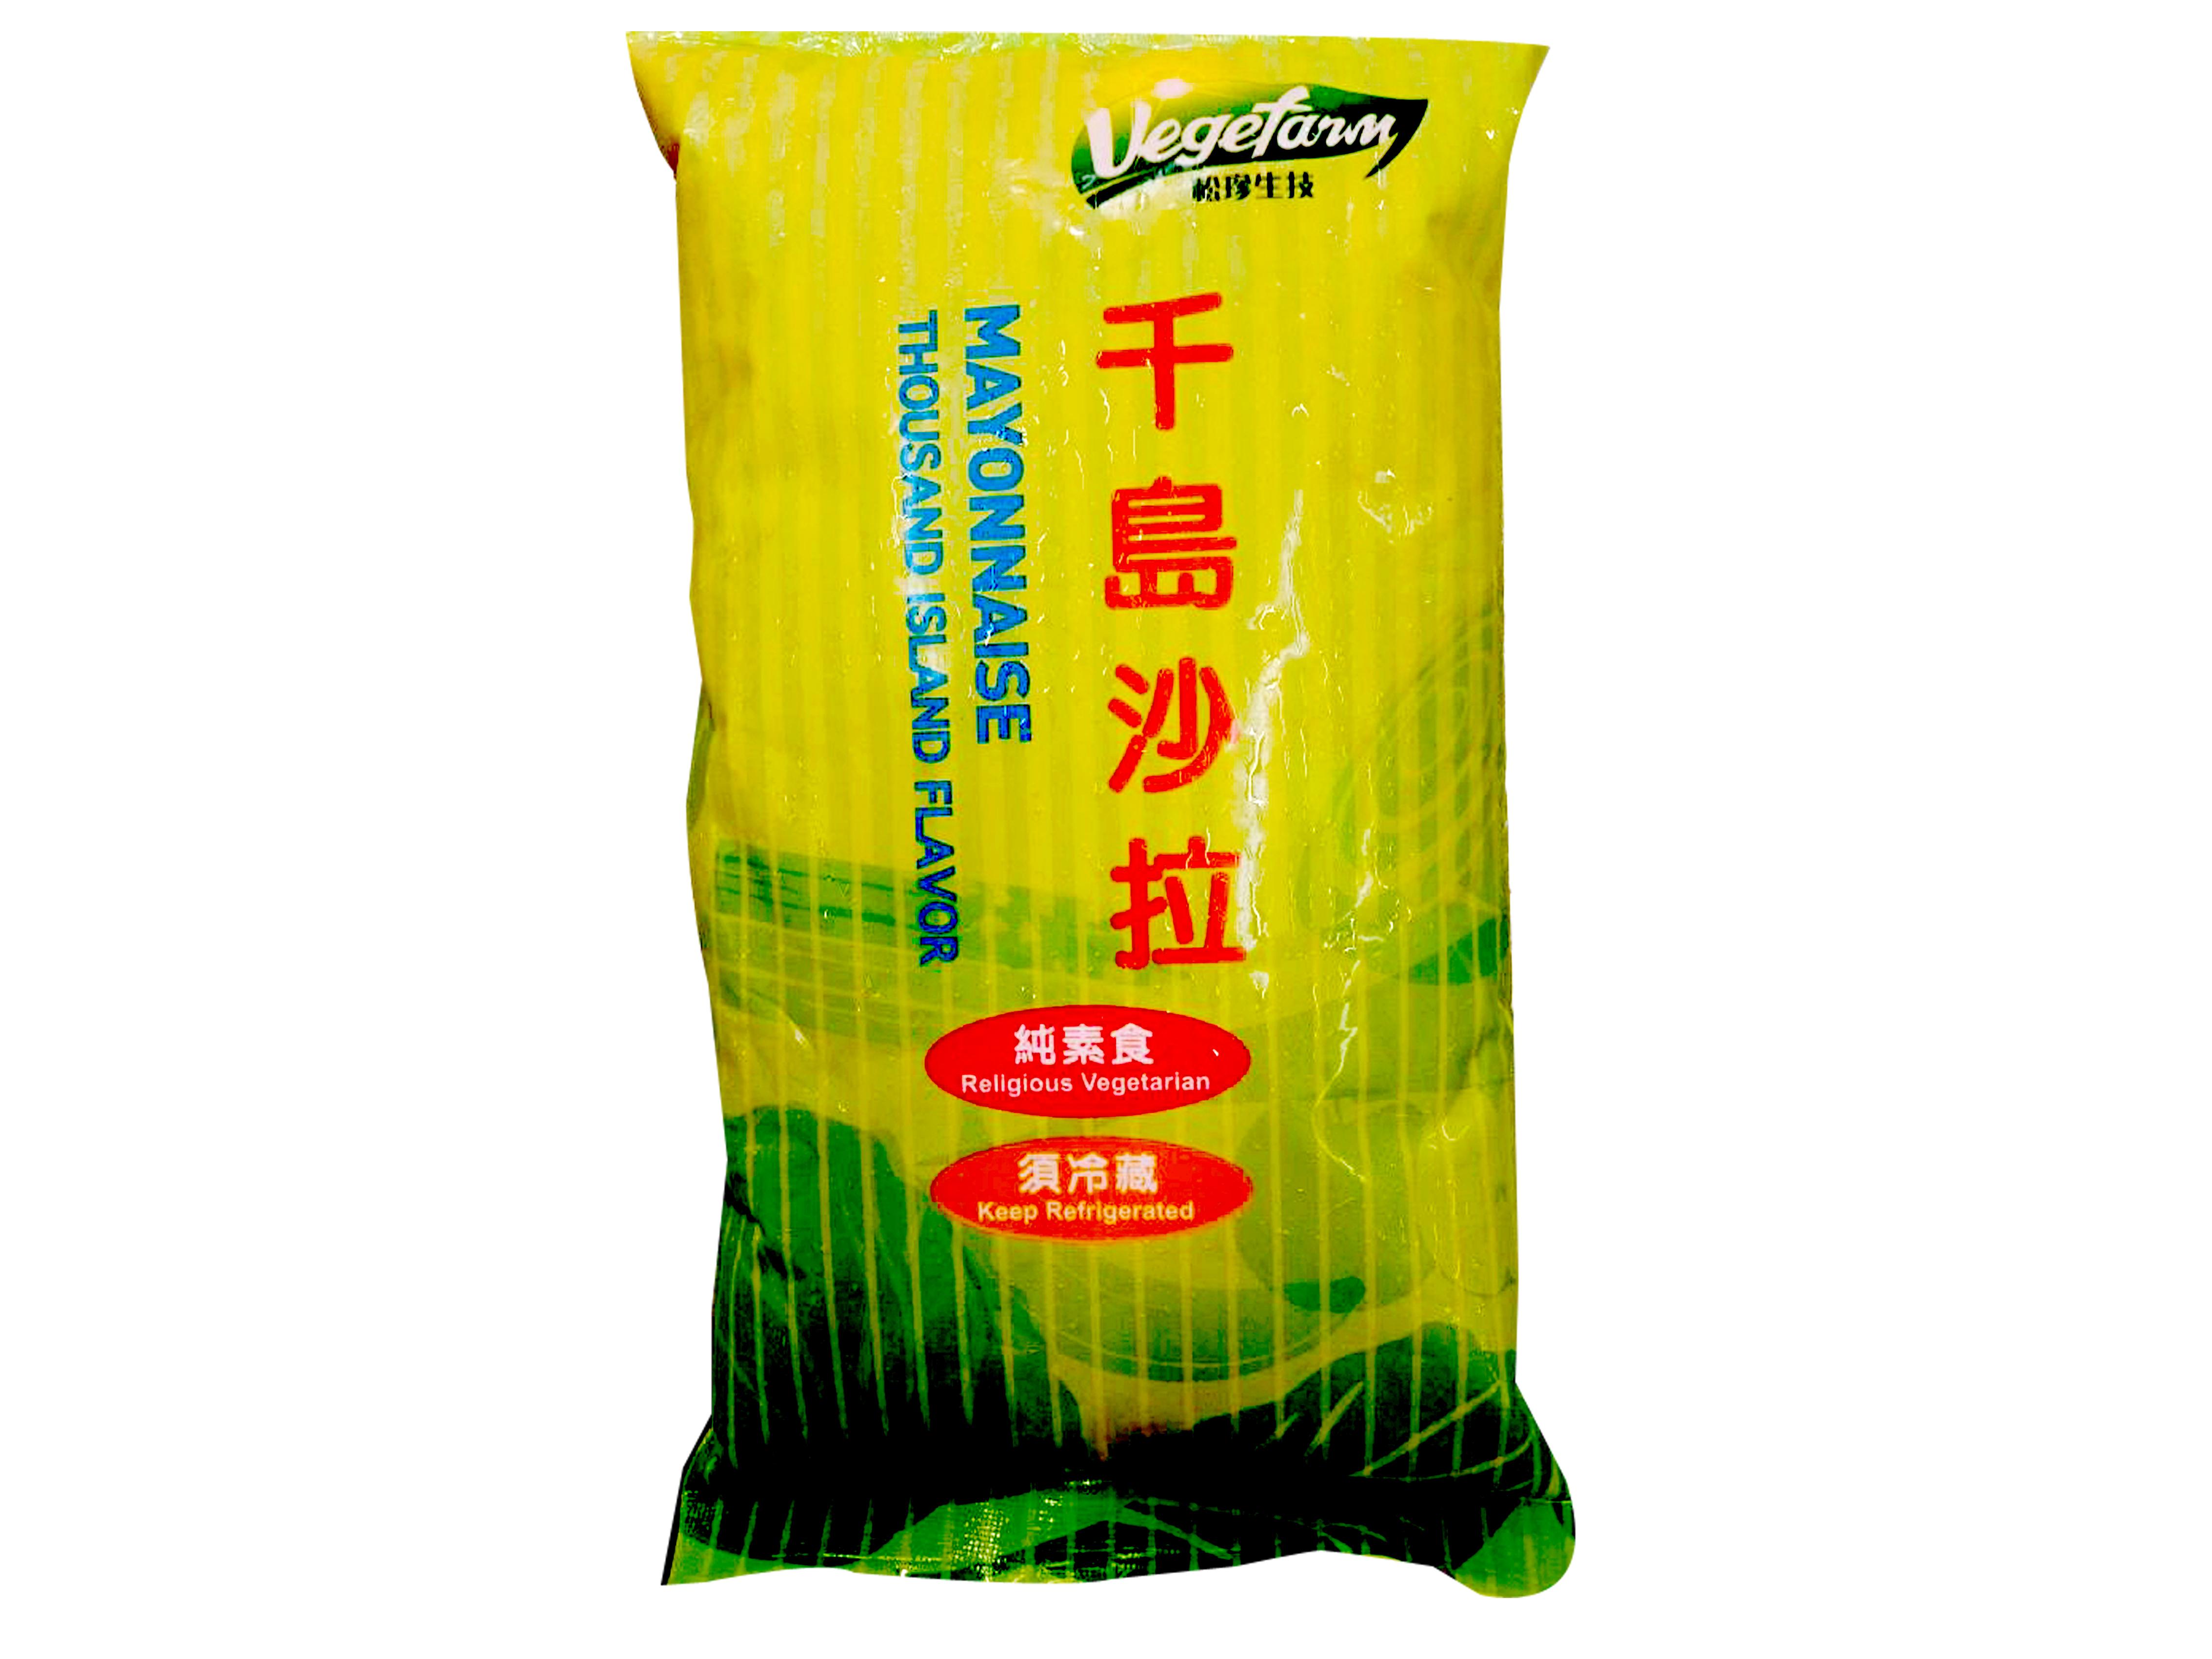 Image Thousand island mayonaise 松珍 - 千岛沙律酱 500grams